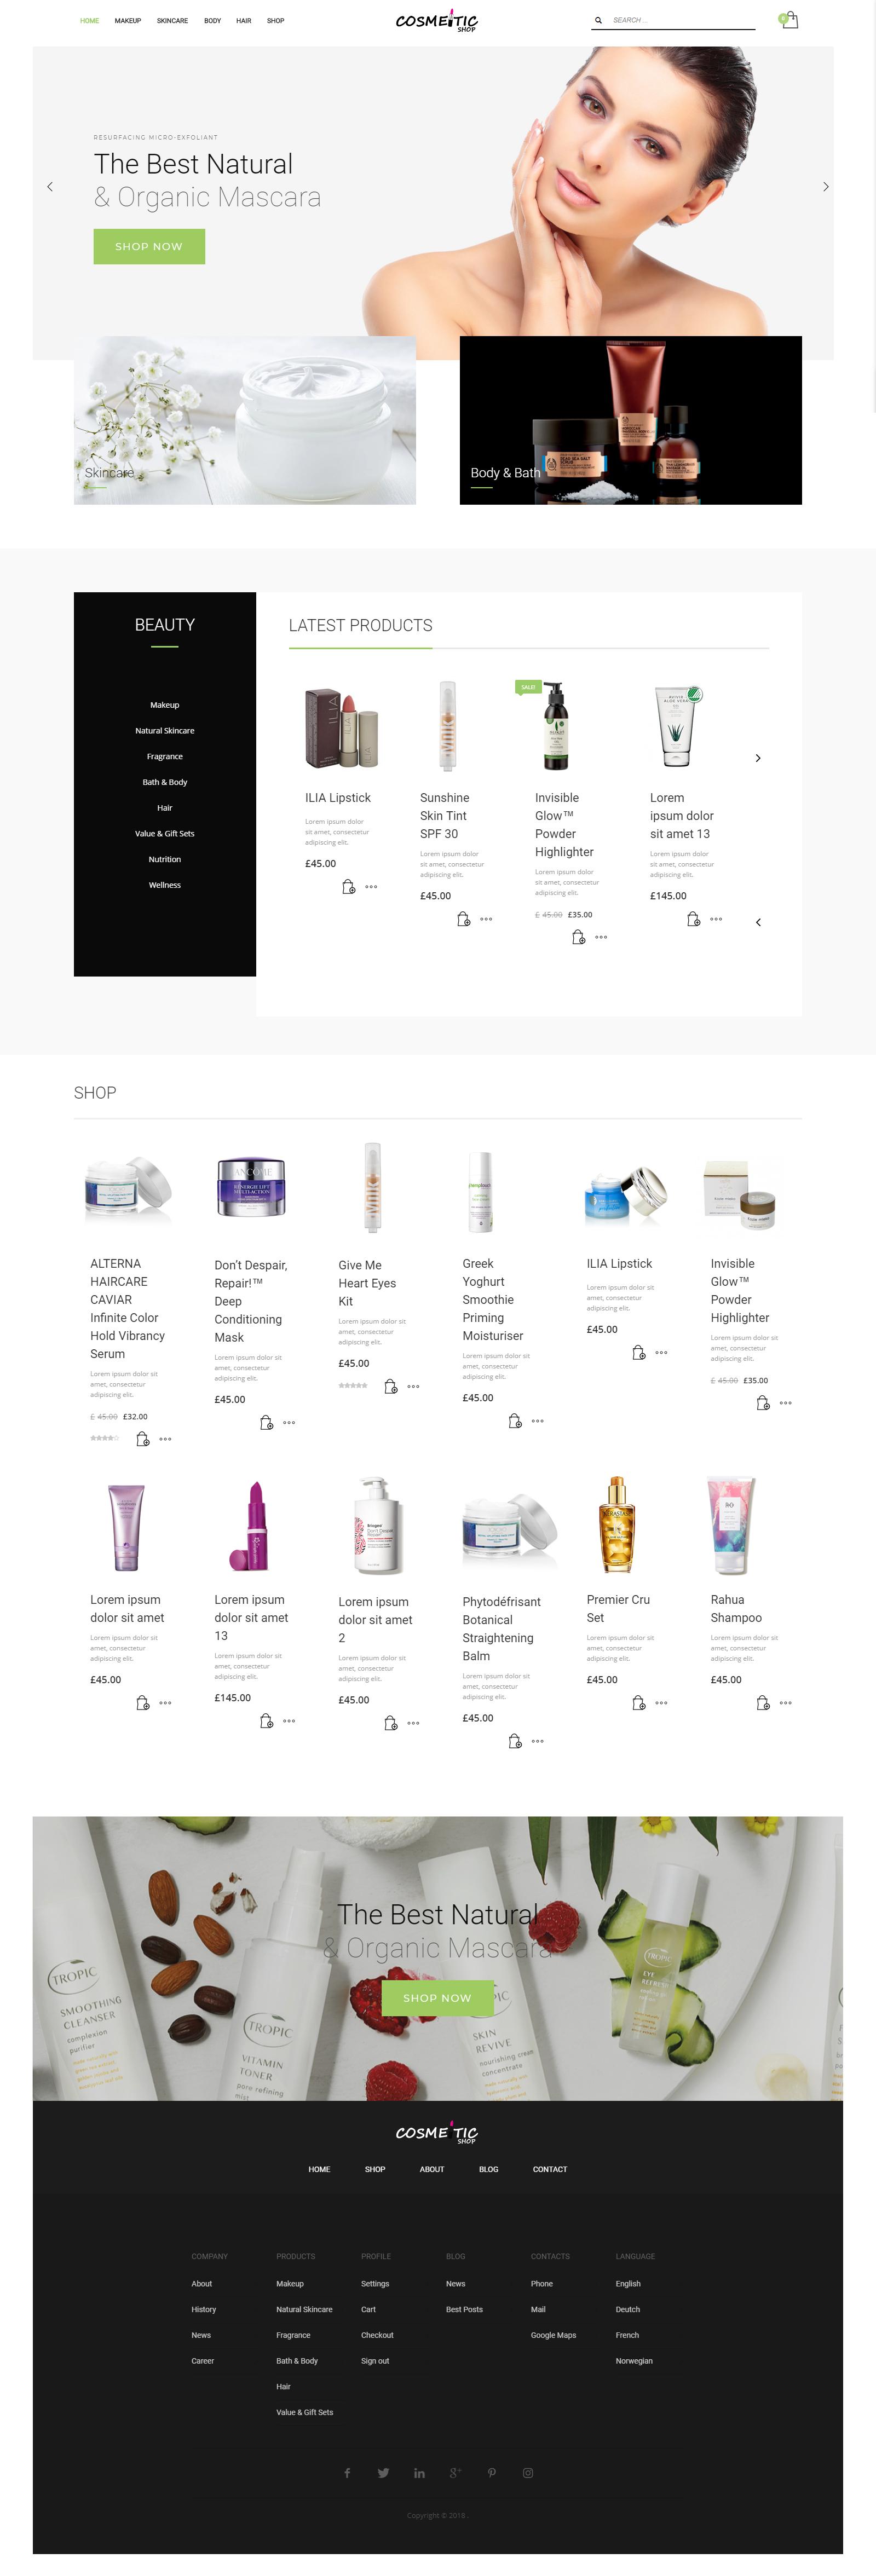 cosmetics - web design